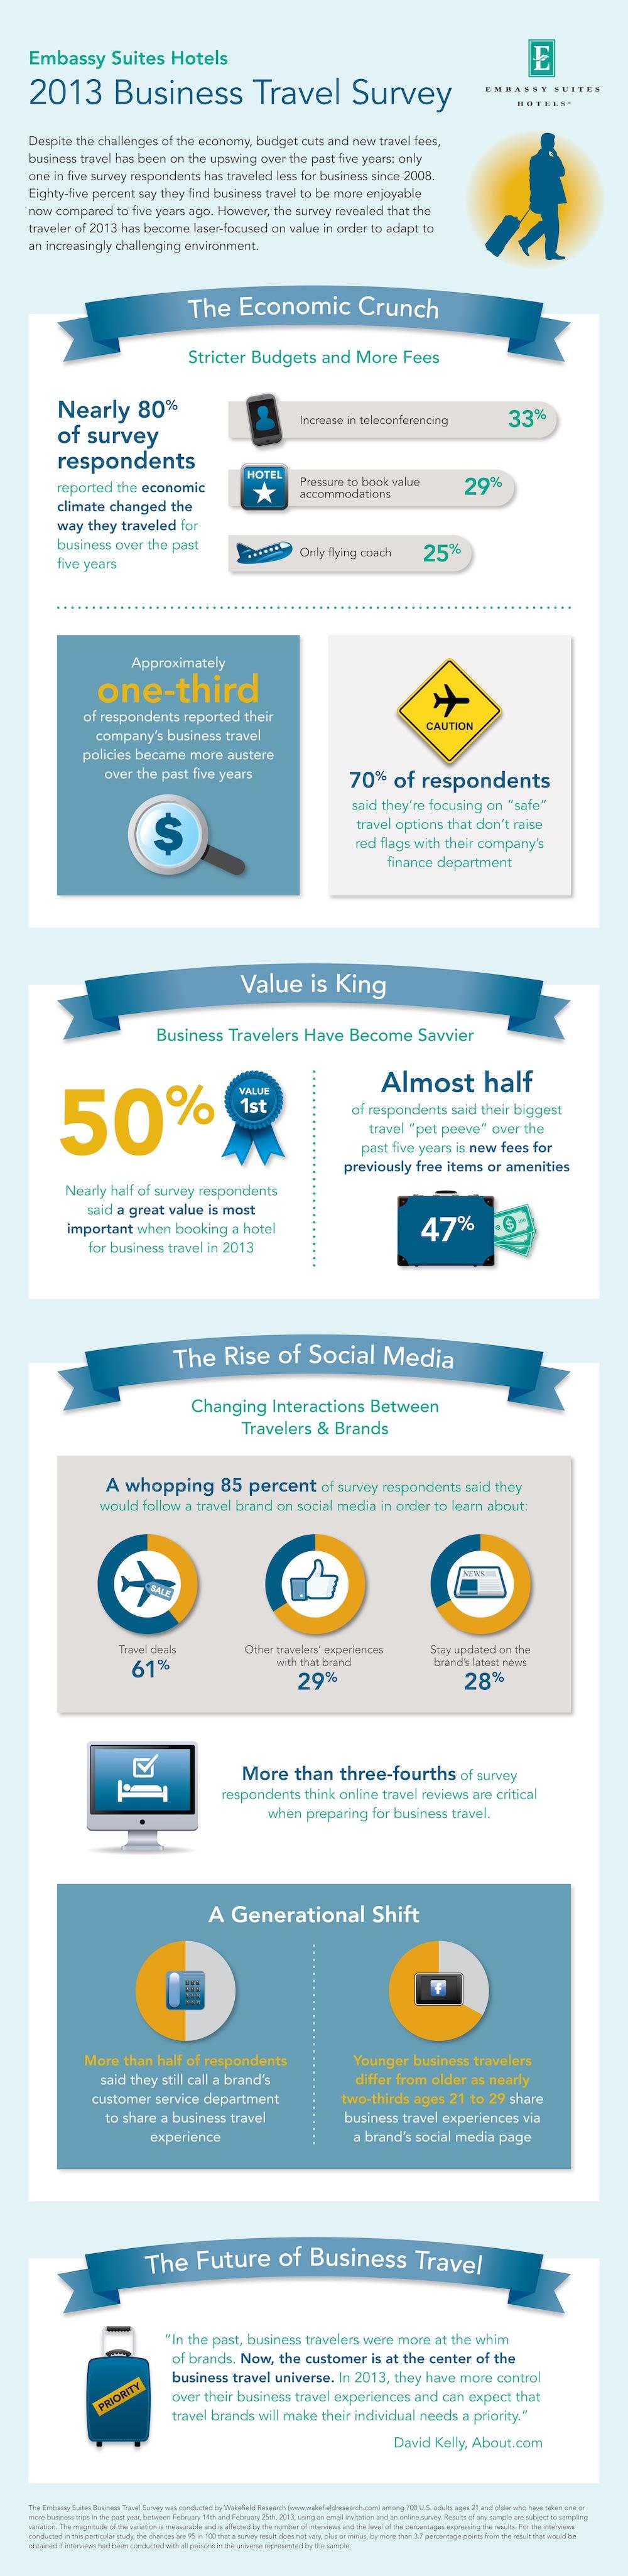 business-travel-social-media